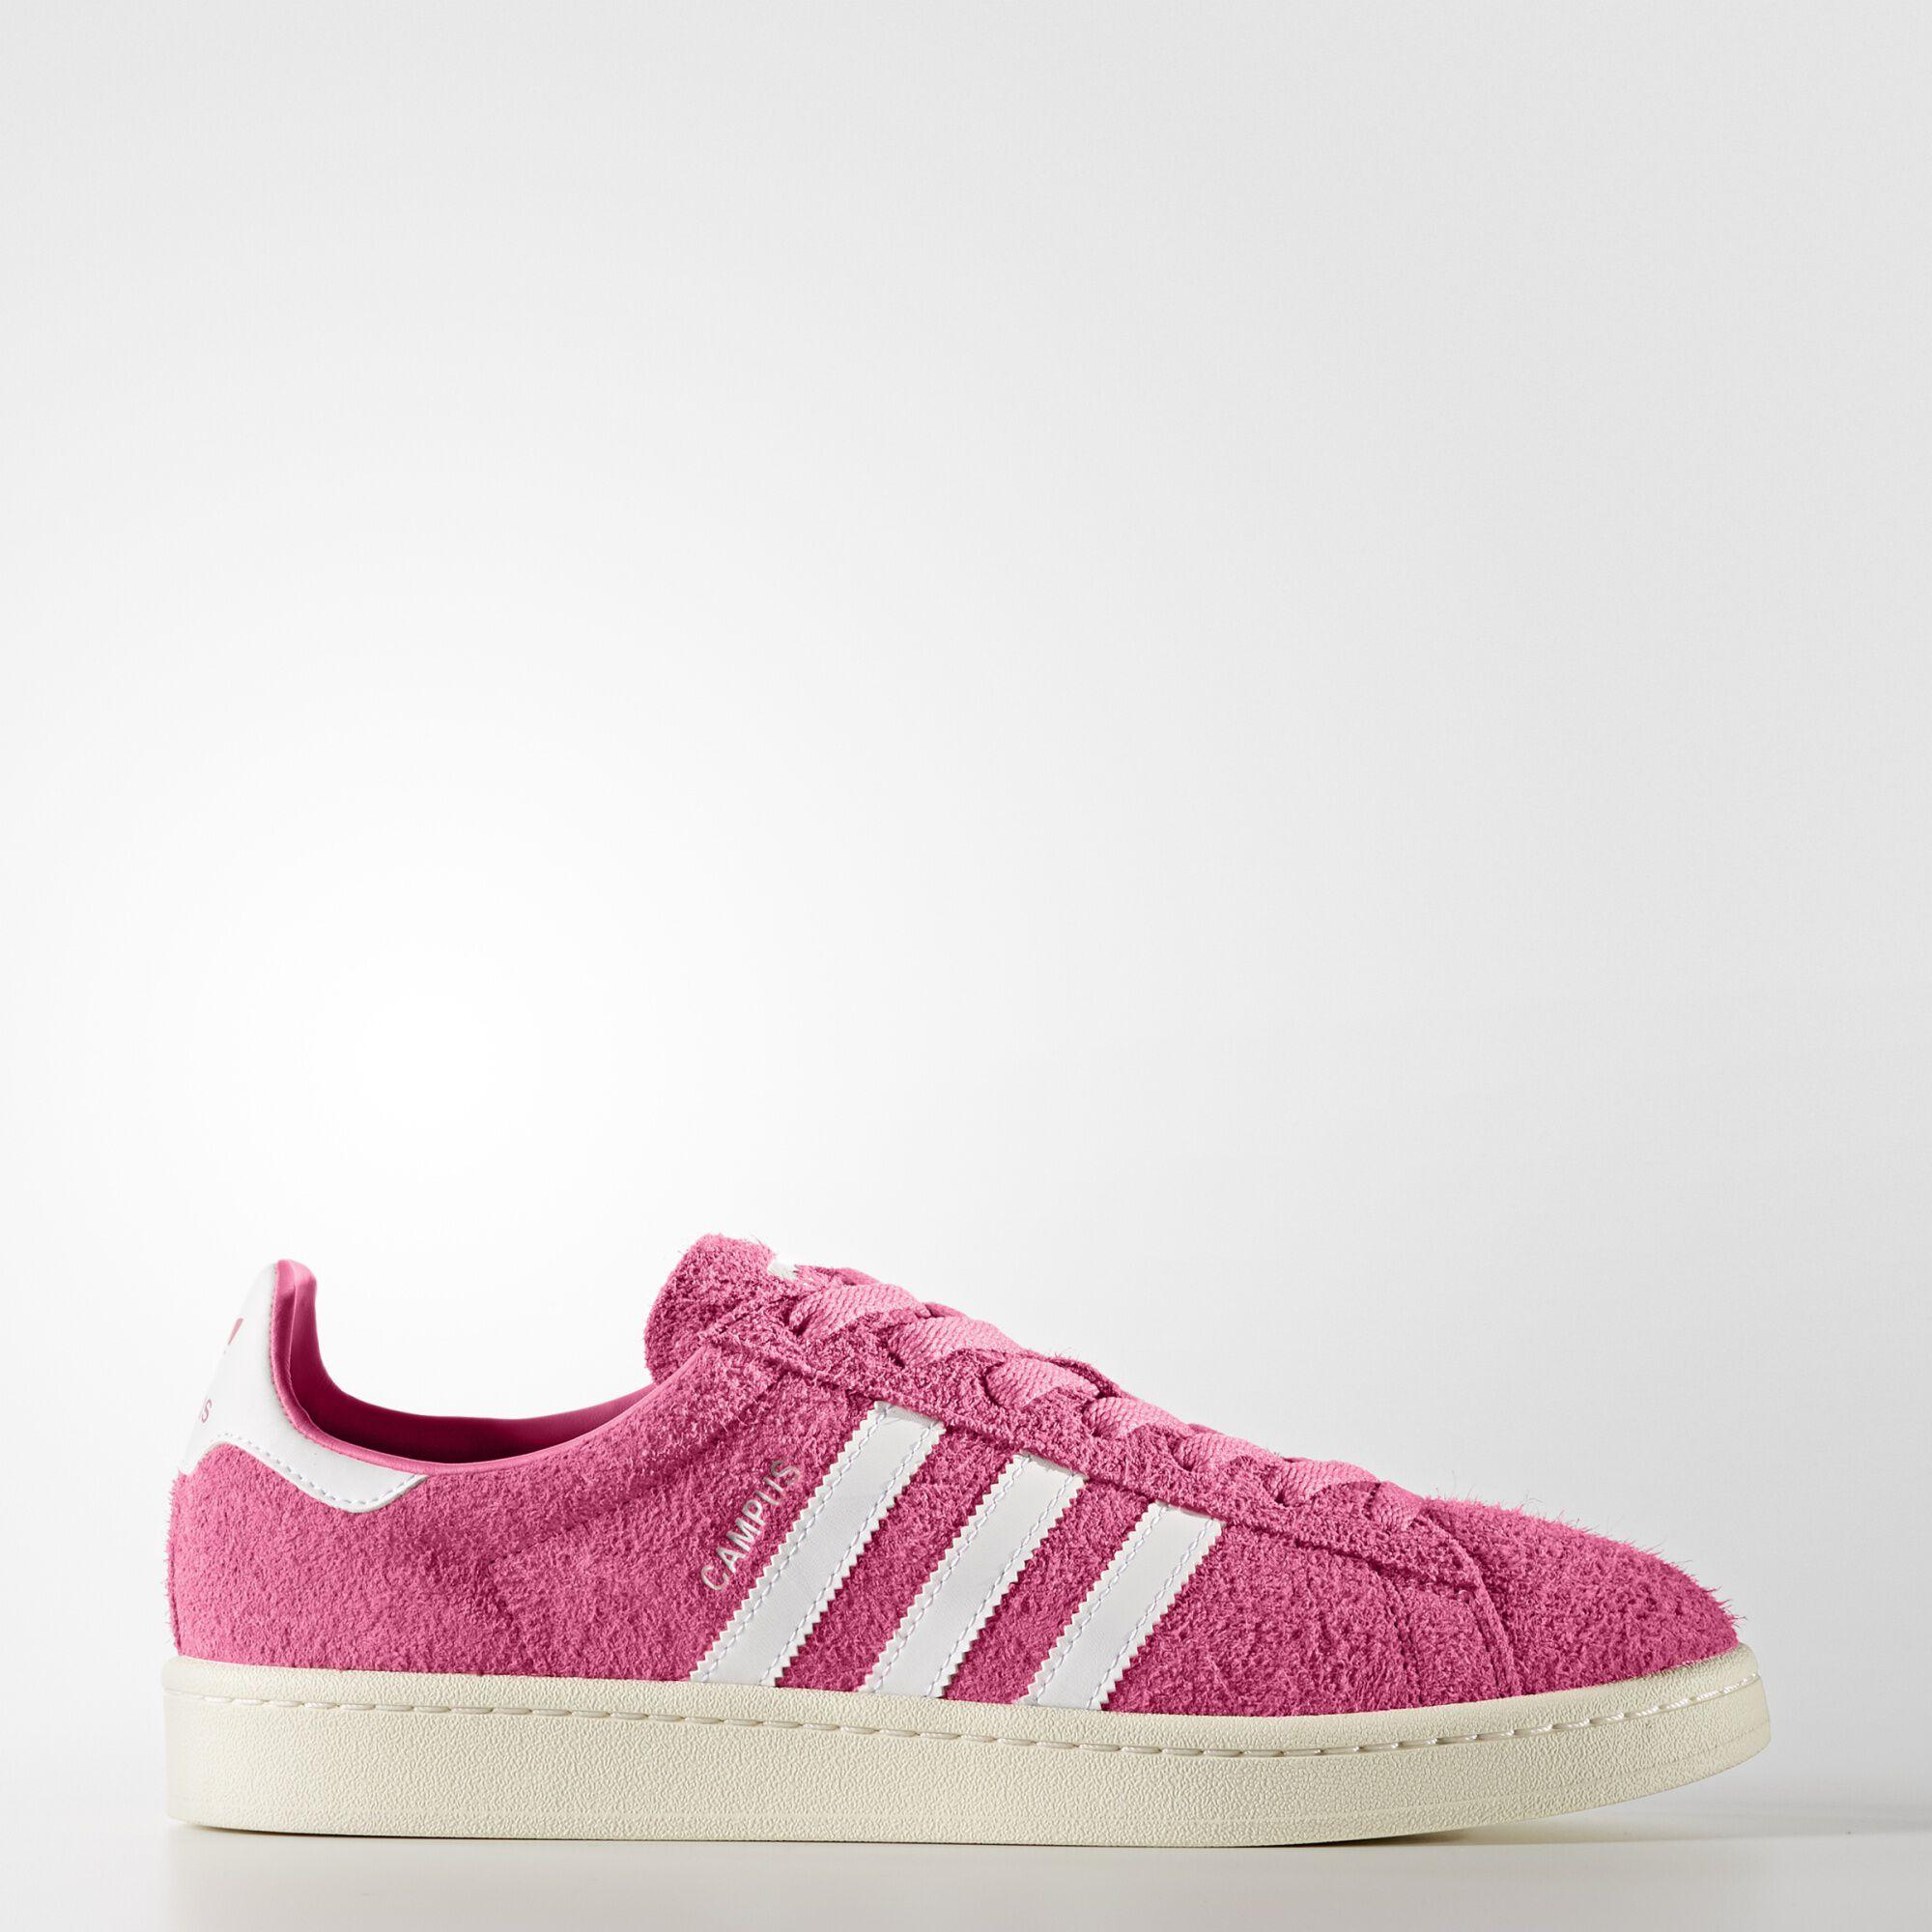 Adidas Campus Shoes Semi Solar Pink Footwear White Cream White BZ0069